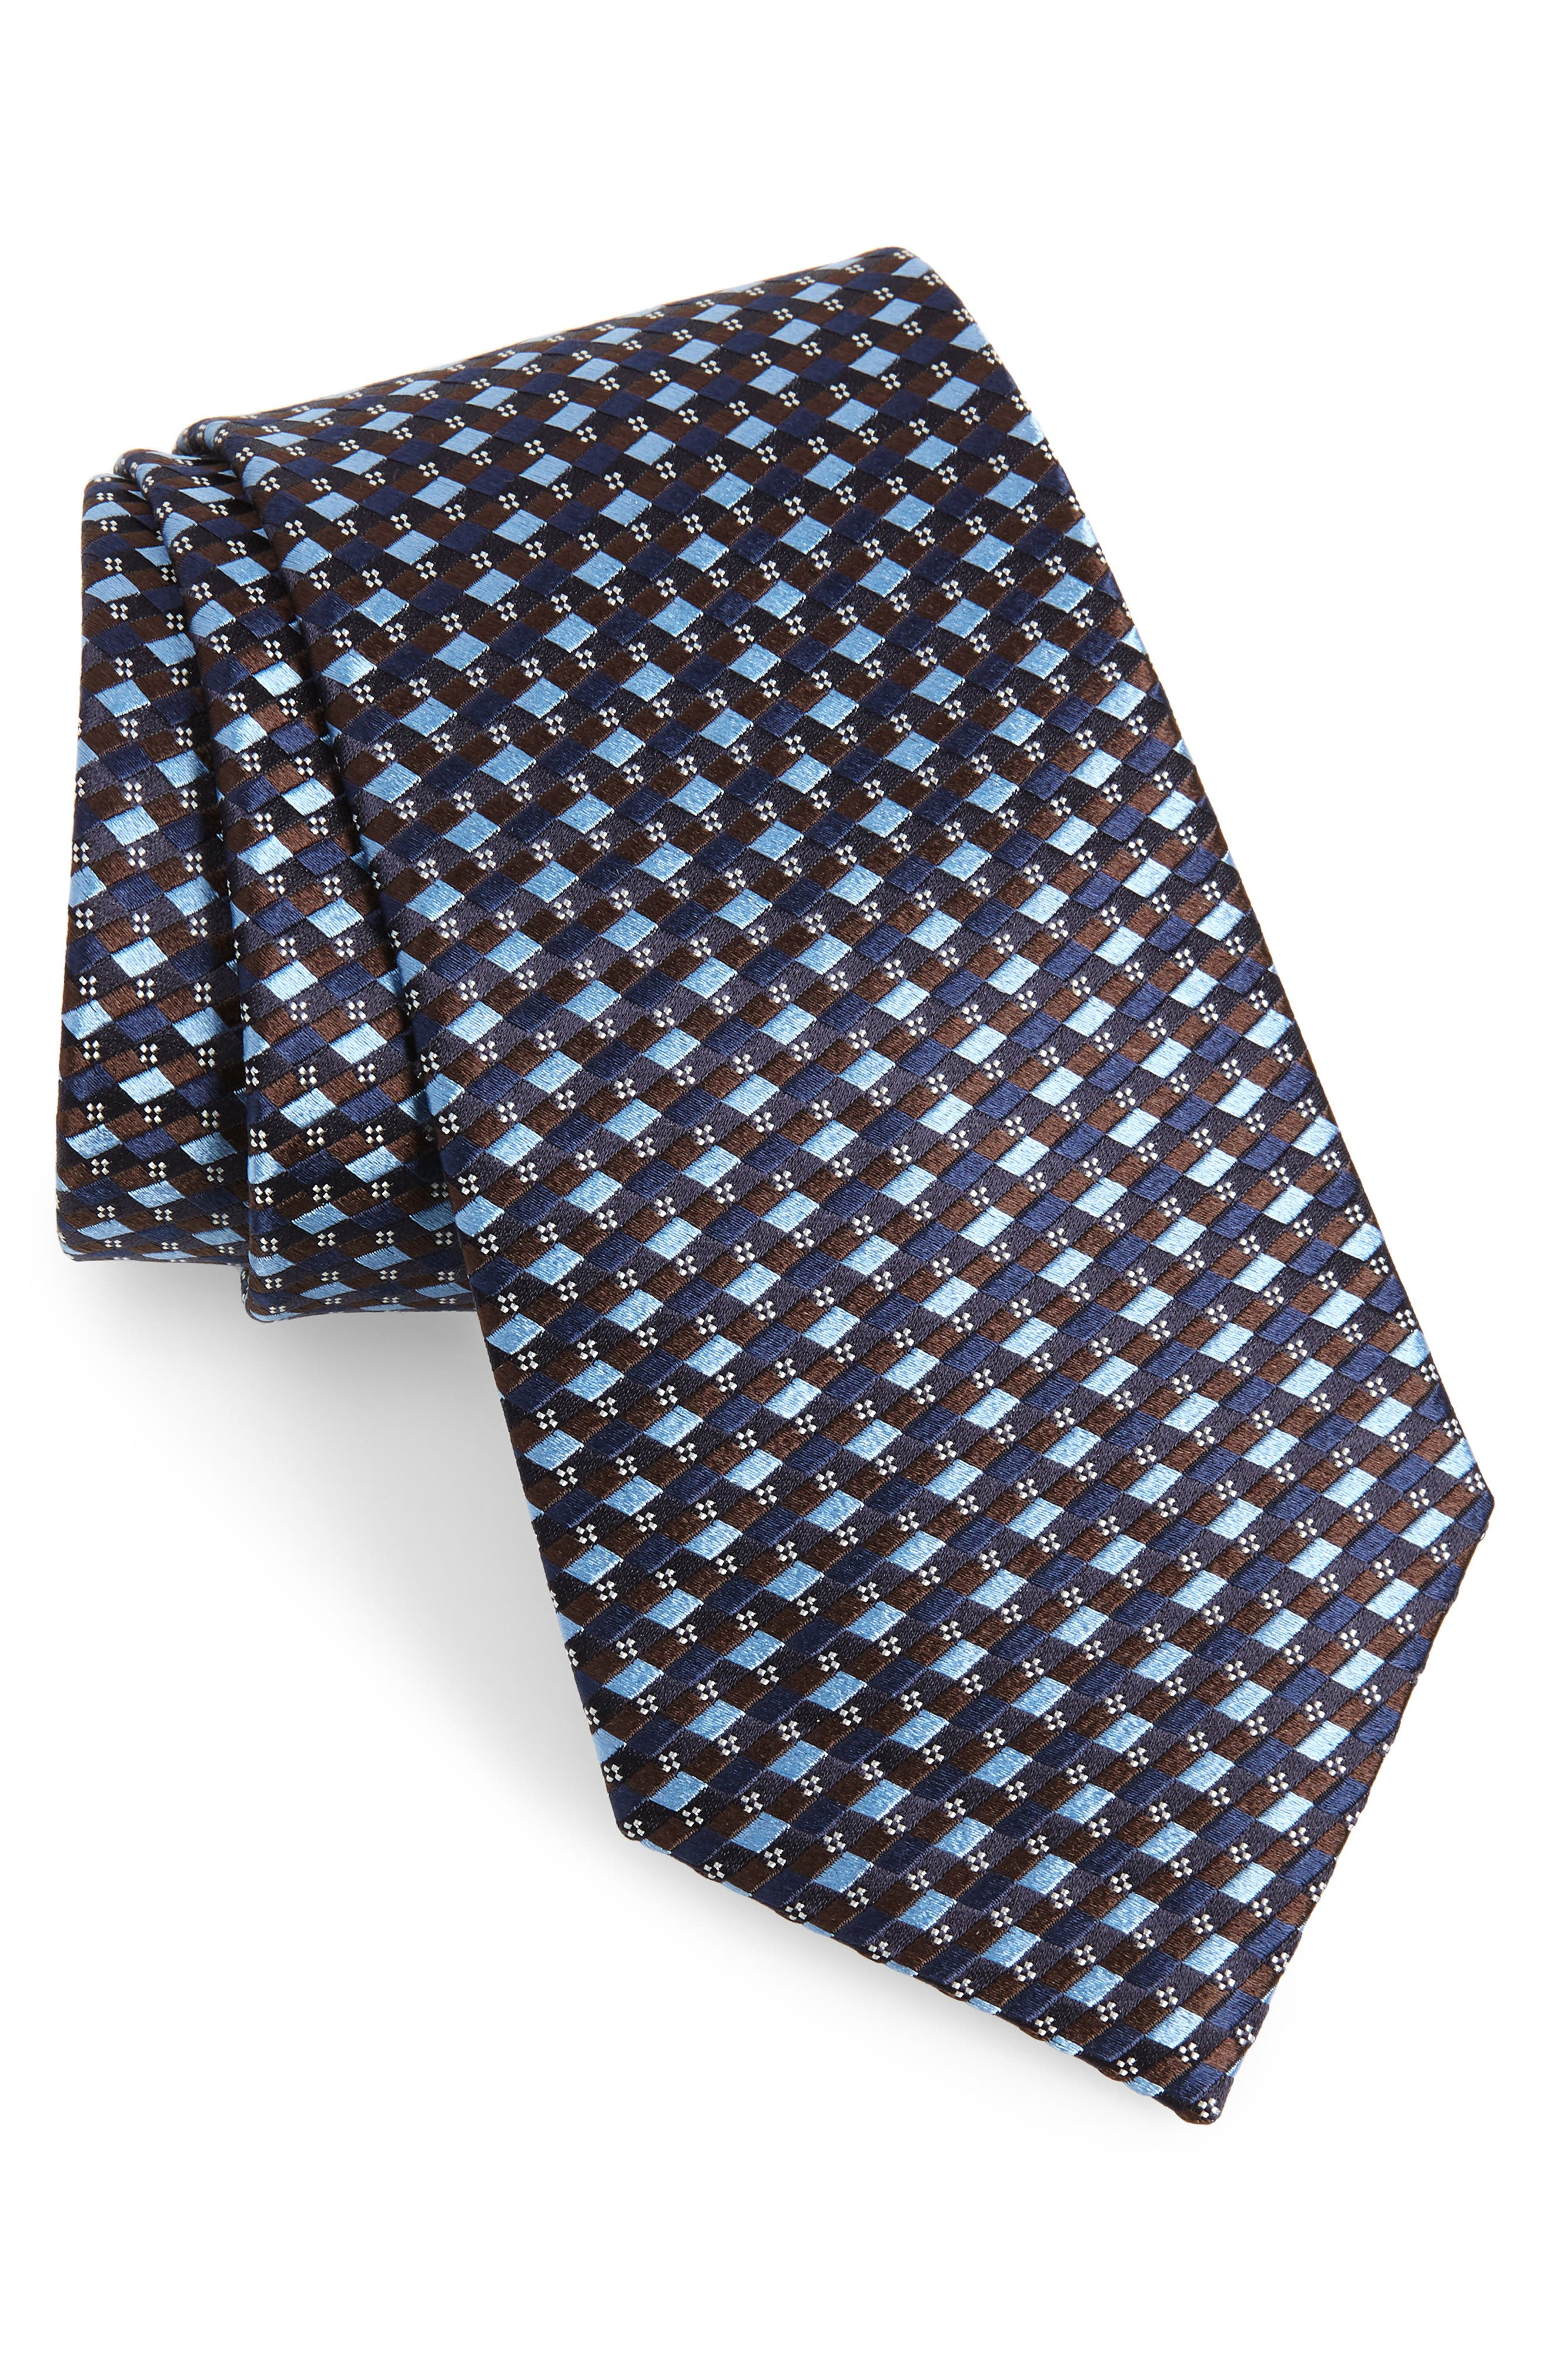 ERMENEGILDO ZEGNA, Geometric Silk Tie, Main thumbnail 1, color, BROWN